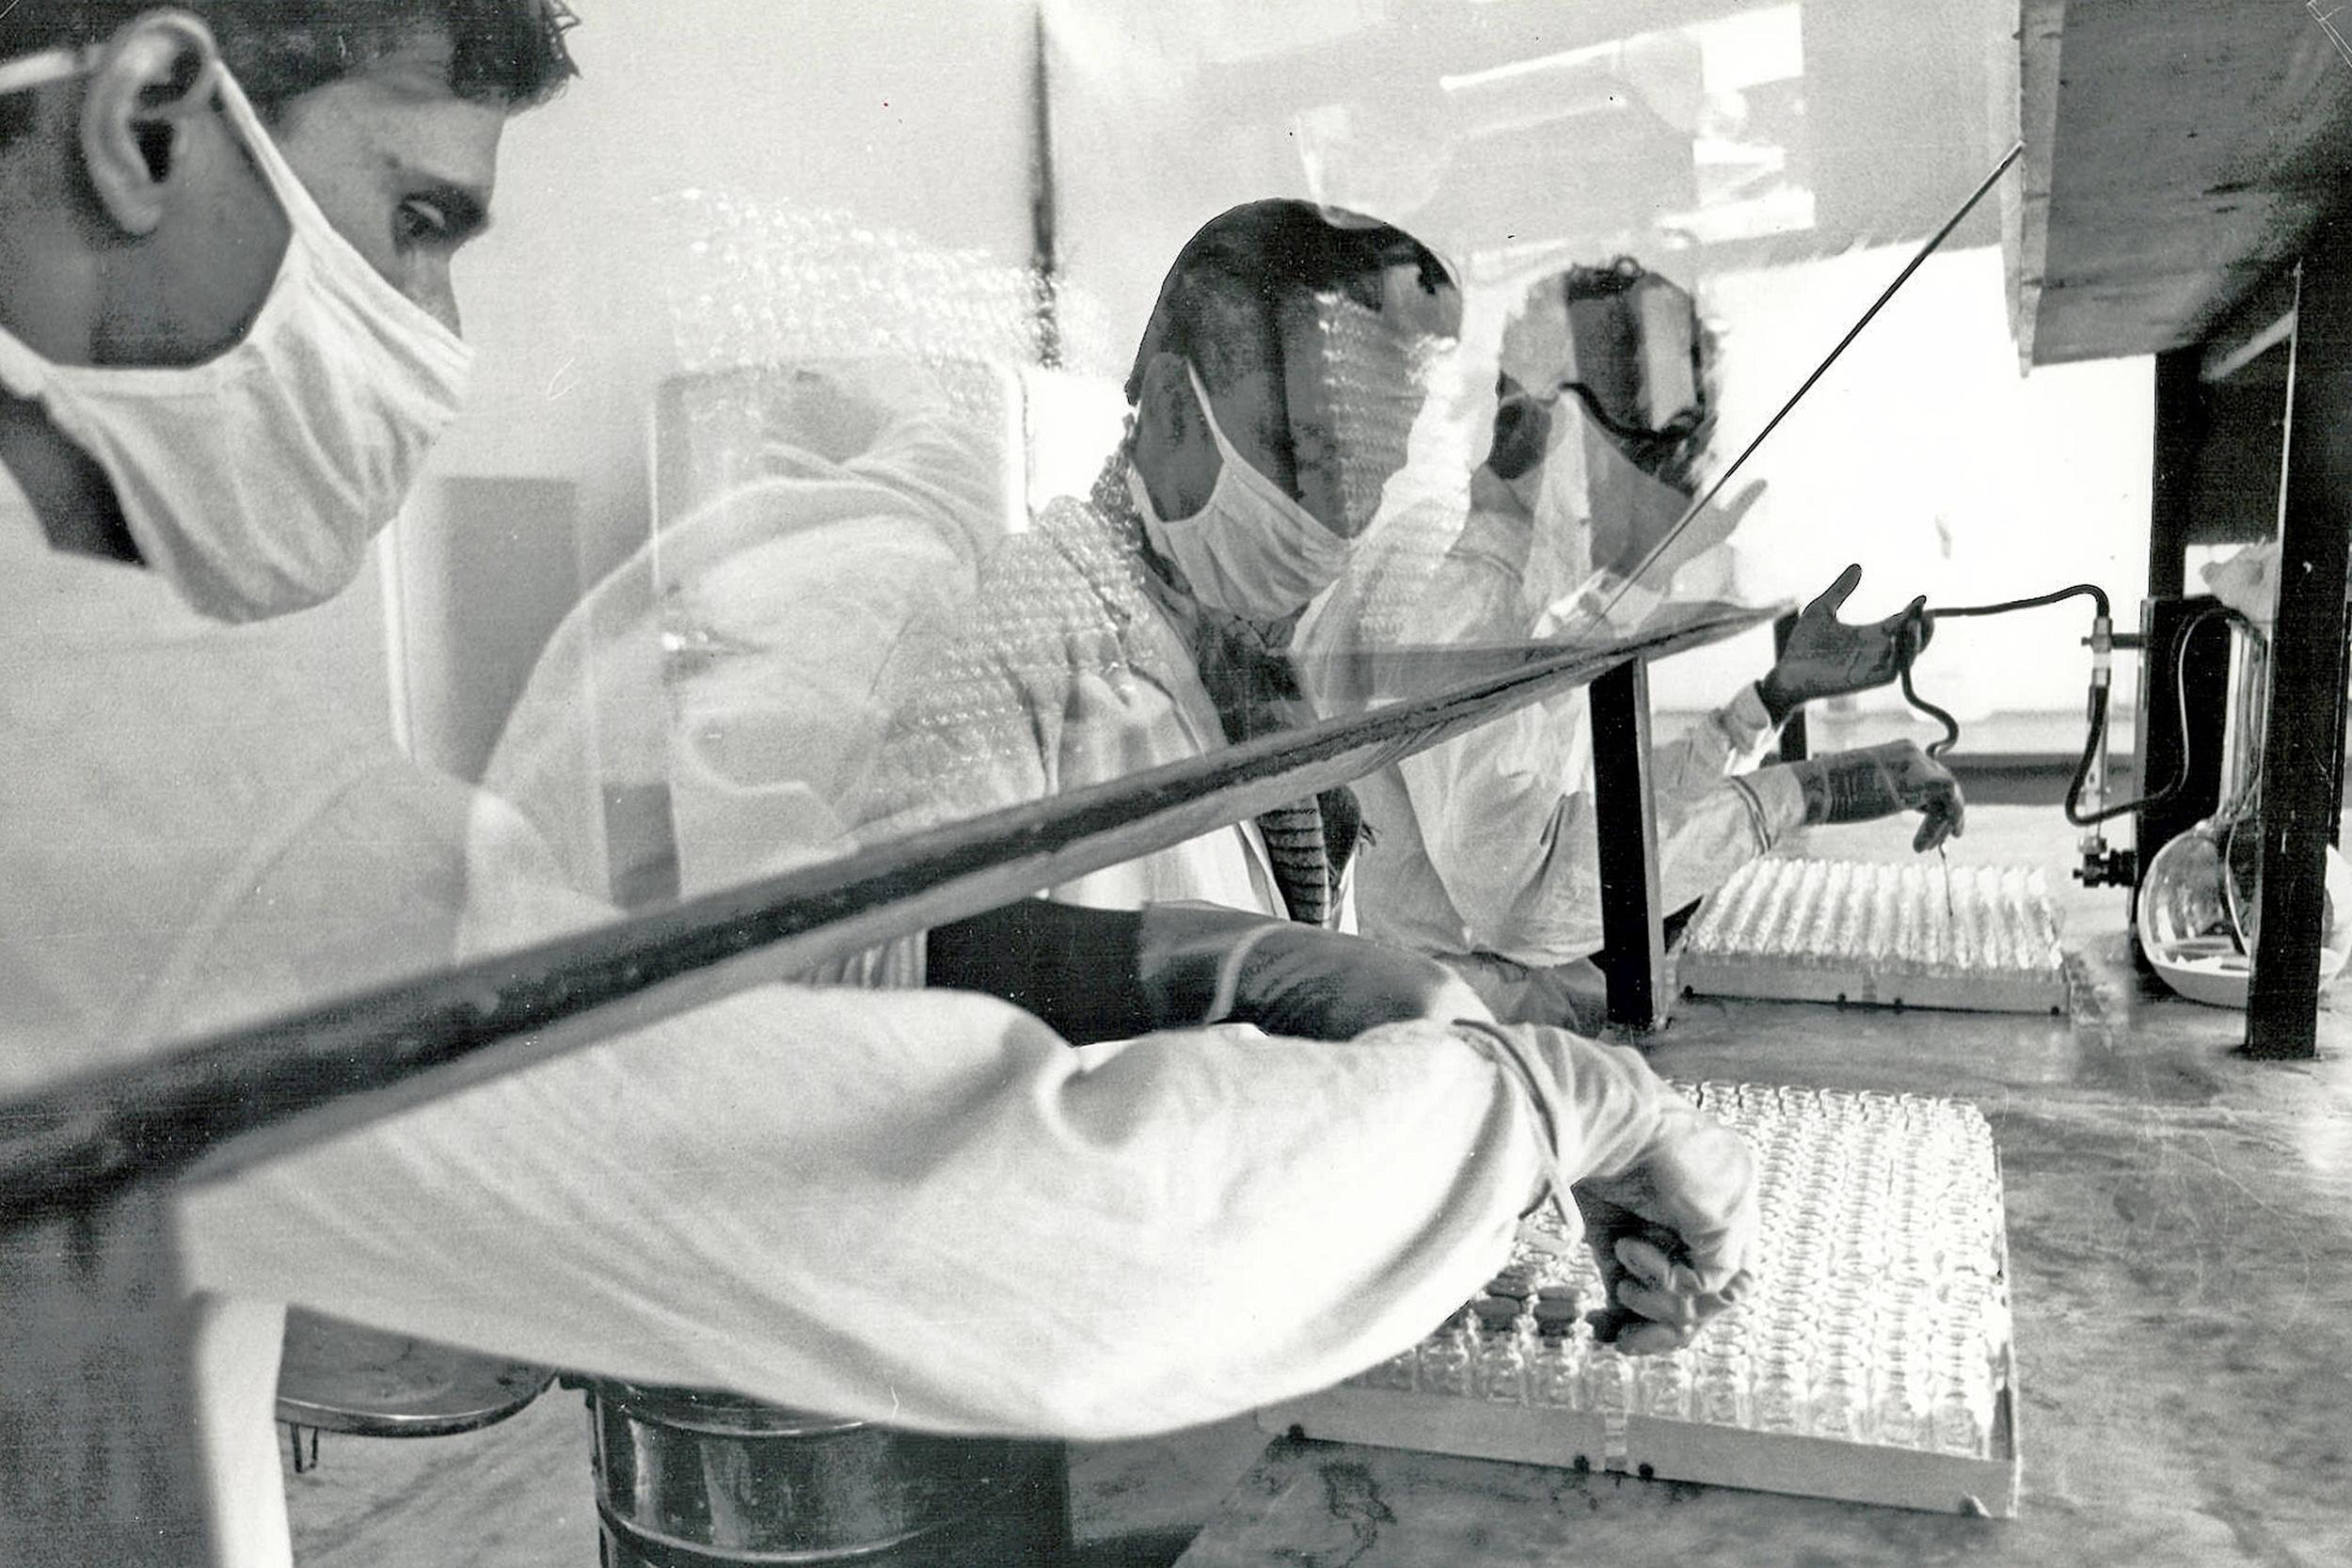 World Health Organization doctors at work on the Smallpox vaccine, World Health Organization